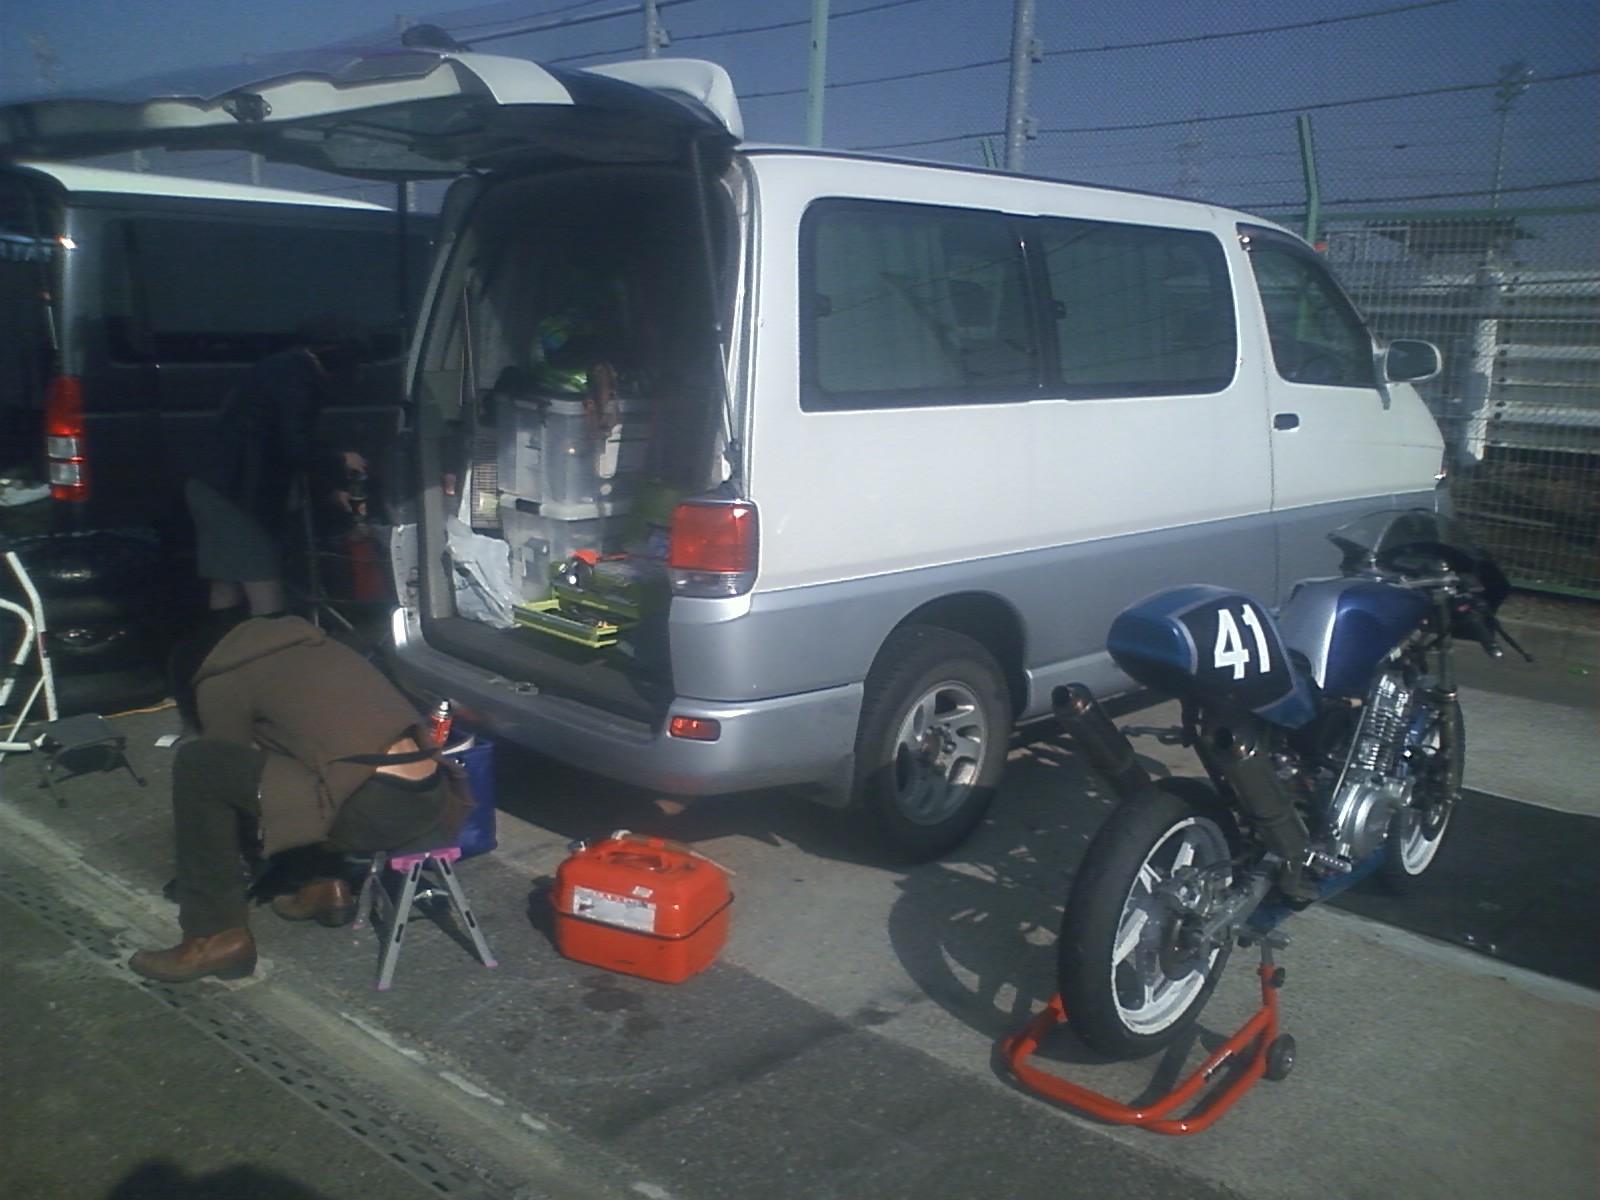 http://img.blogs.yahoo.co.jp/ybi/1/13/f5/tetsutaro499/folder/1475934/img_1475934_49288690_1?1256830836